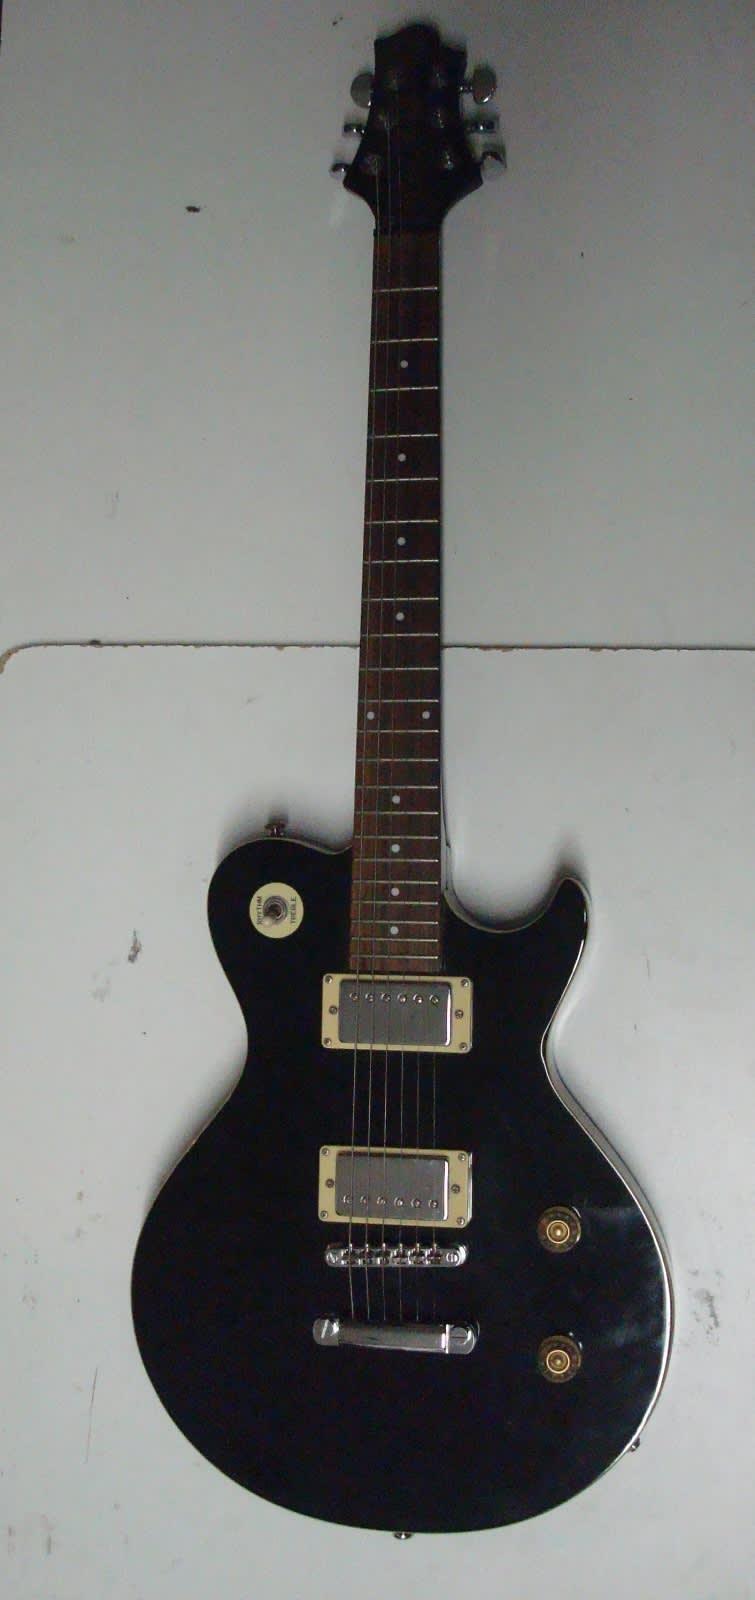 greg bennett av1 black signature series electric guitar reverb. Black Bedroom Furniture Sets. Home Design Ideas